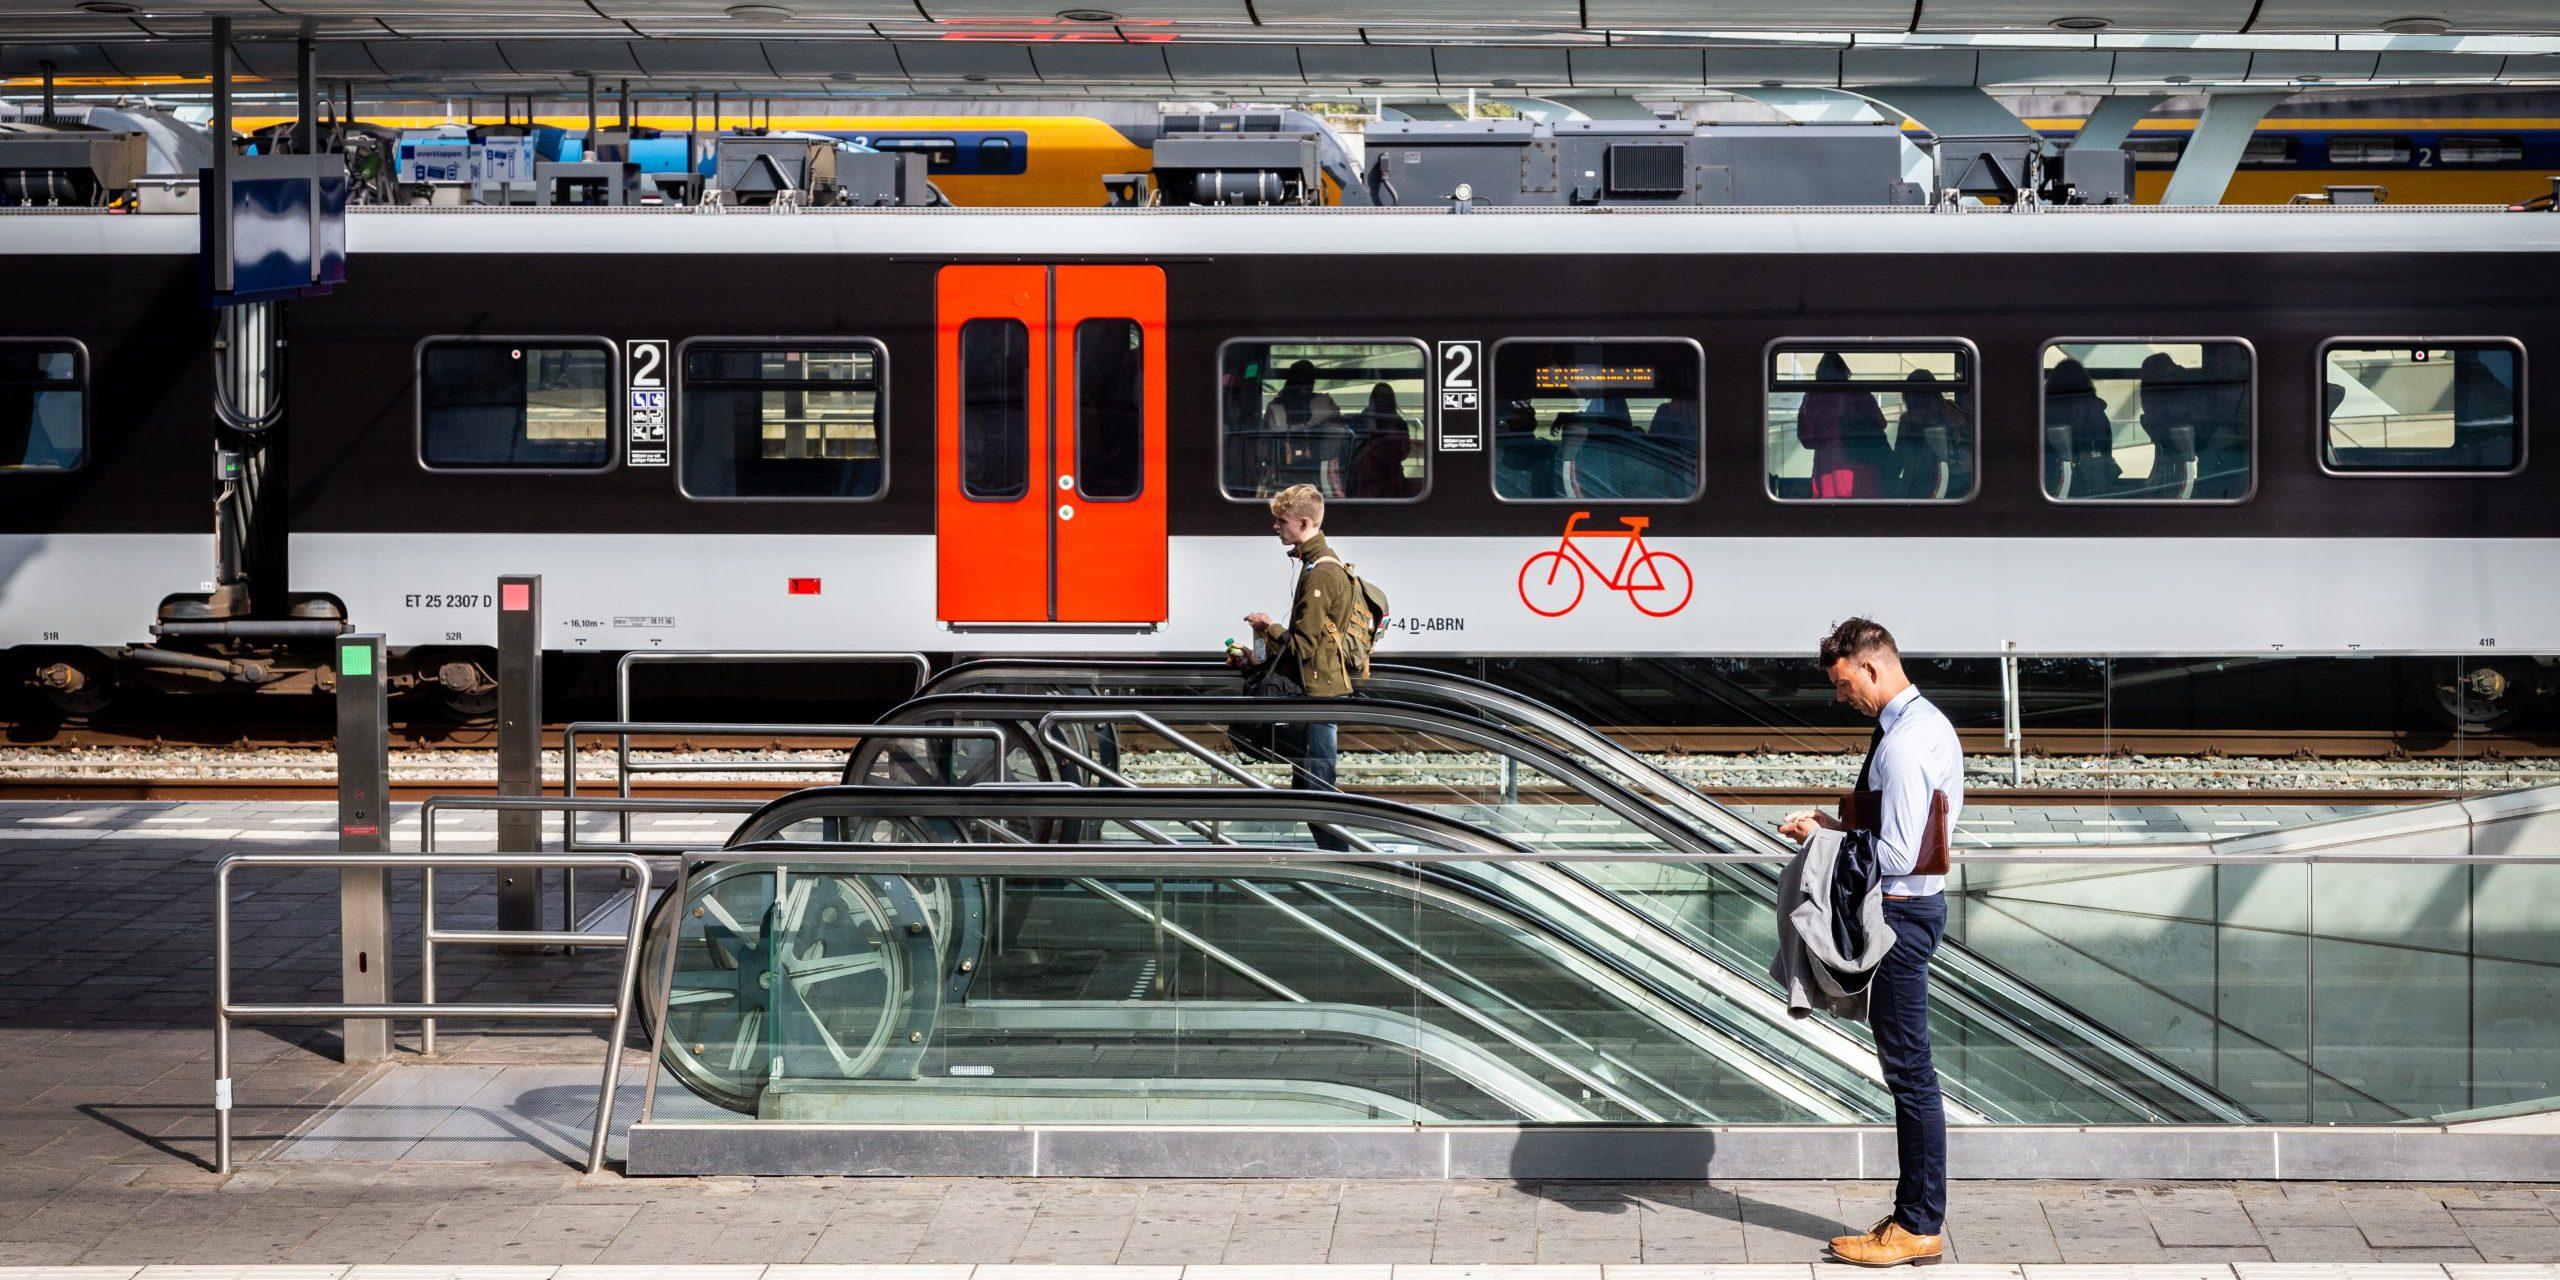 beloftes duurzame mobiliteit